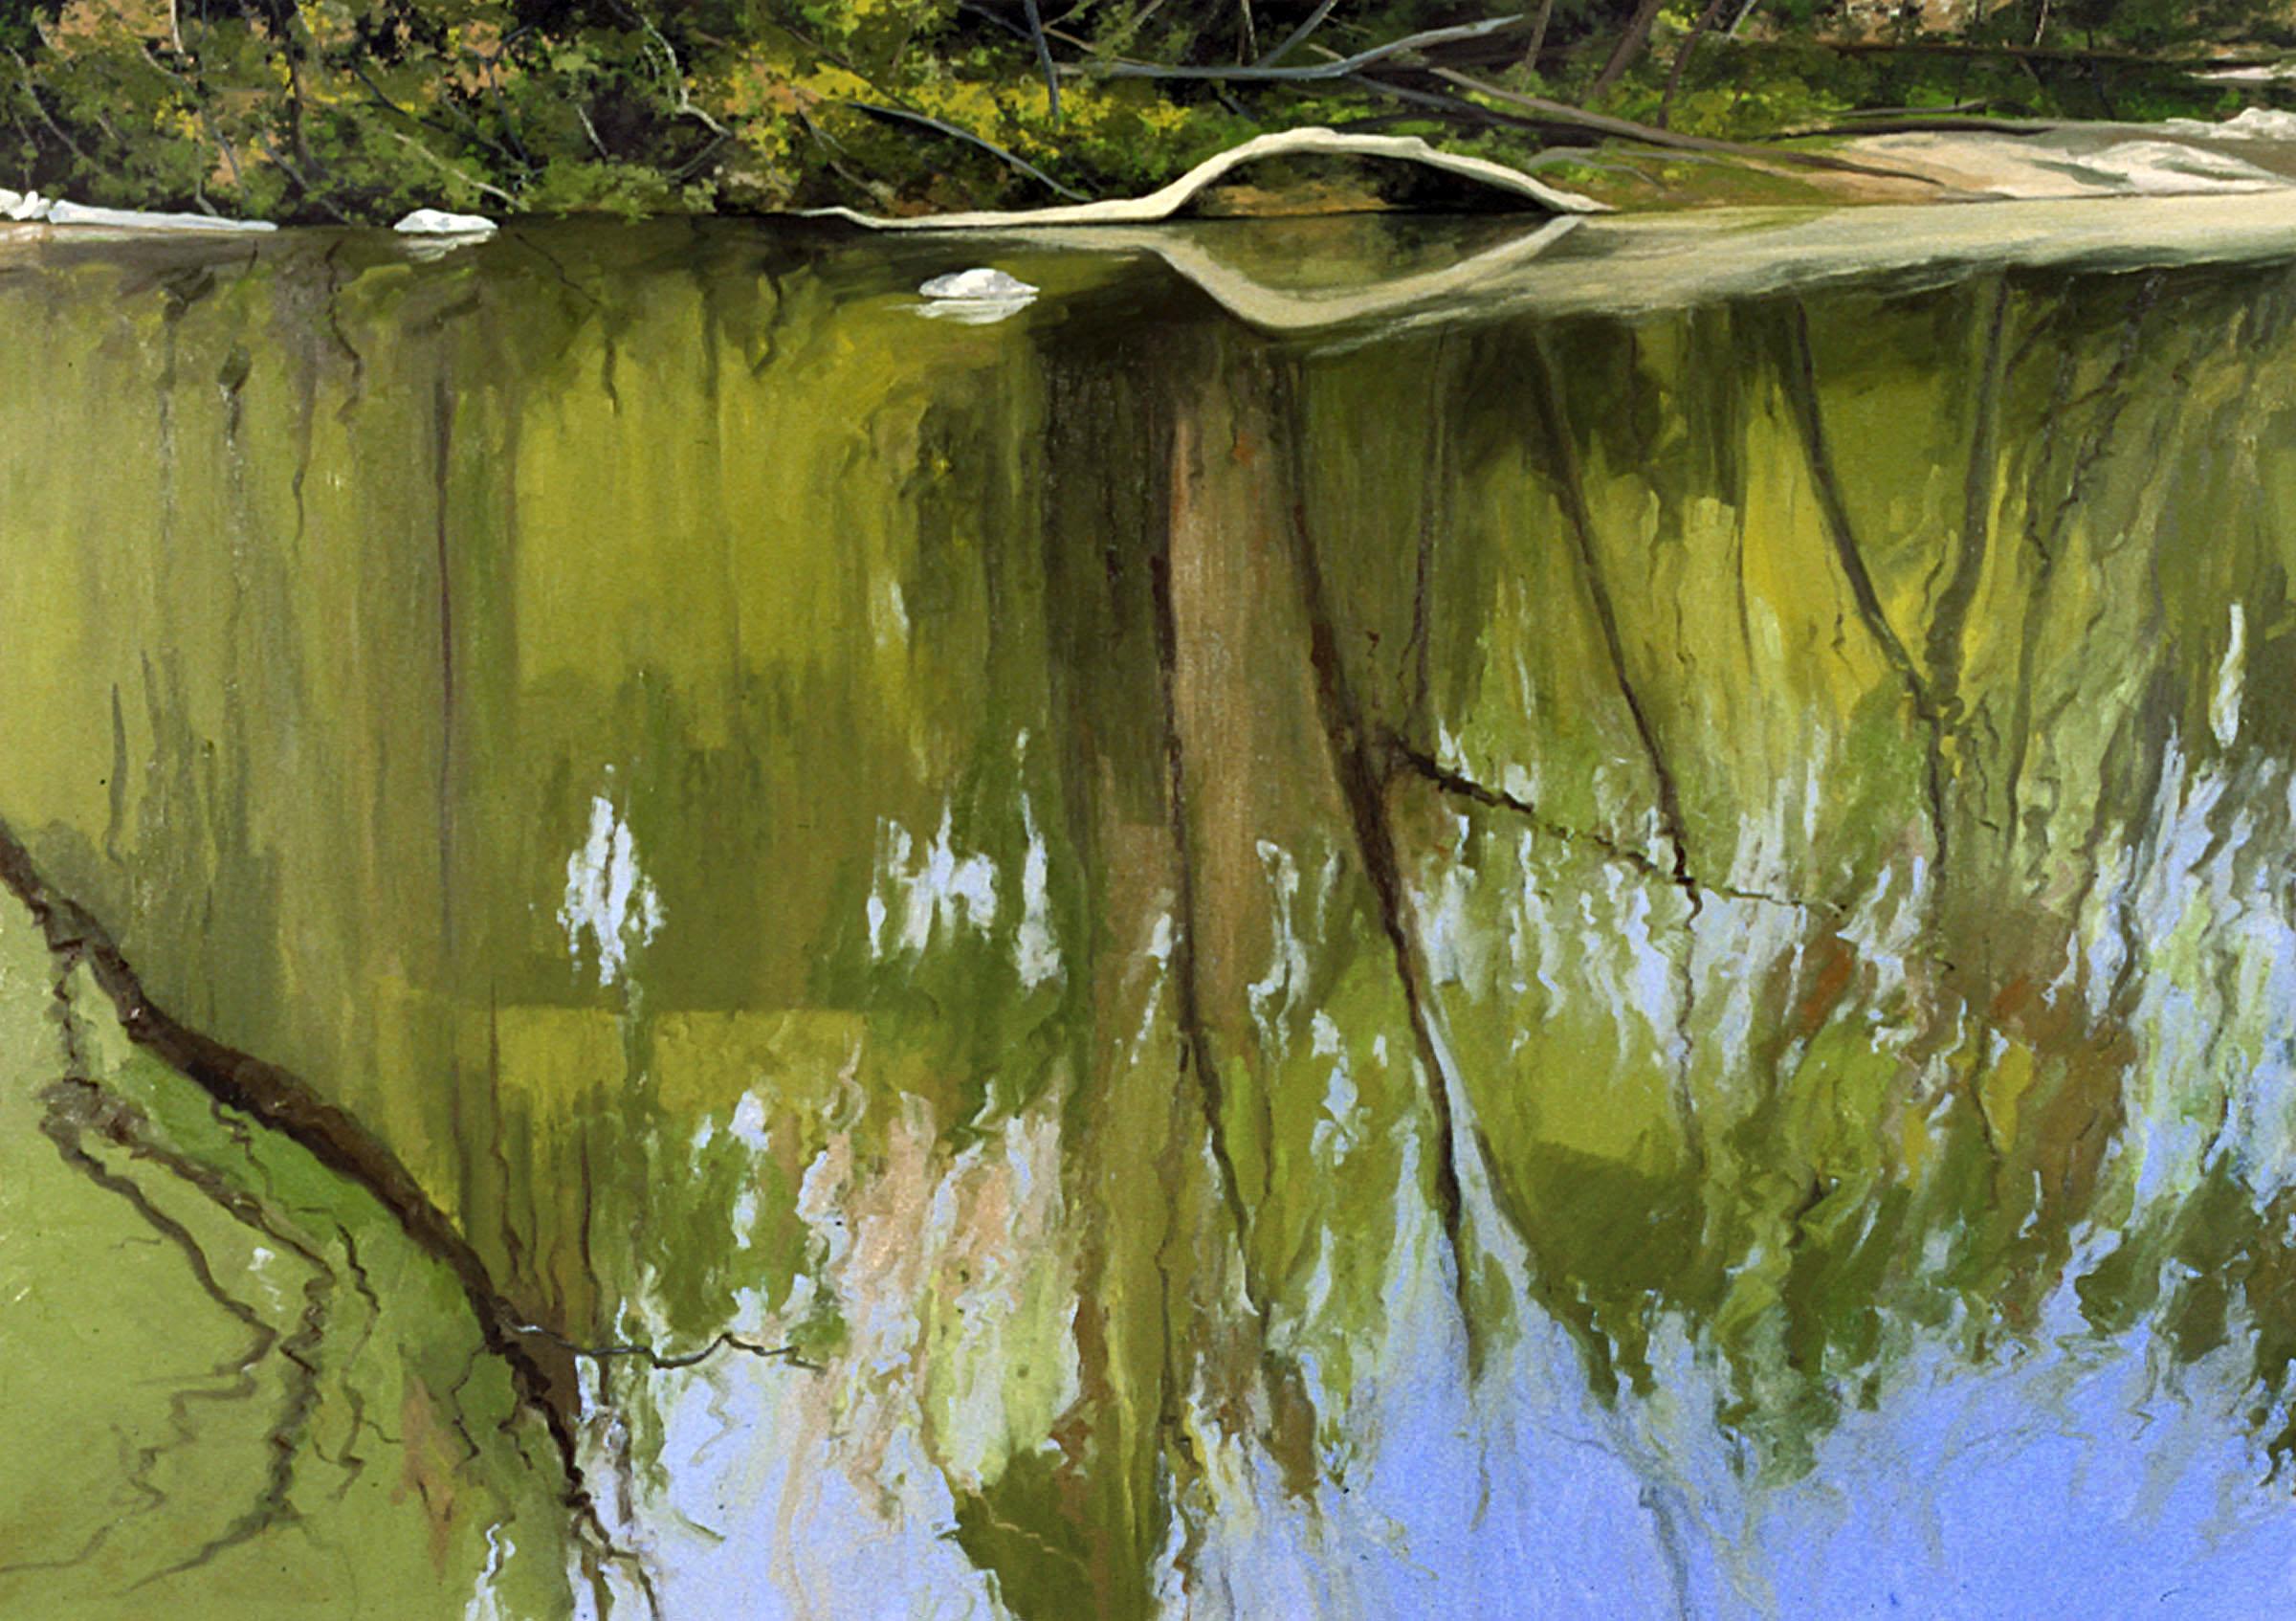 Wissahickon Reflections: East Frieze, No. 1